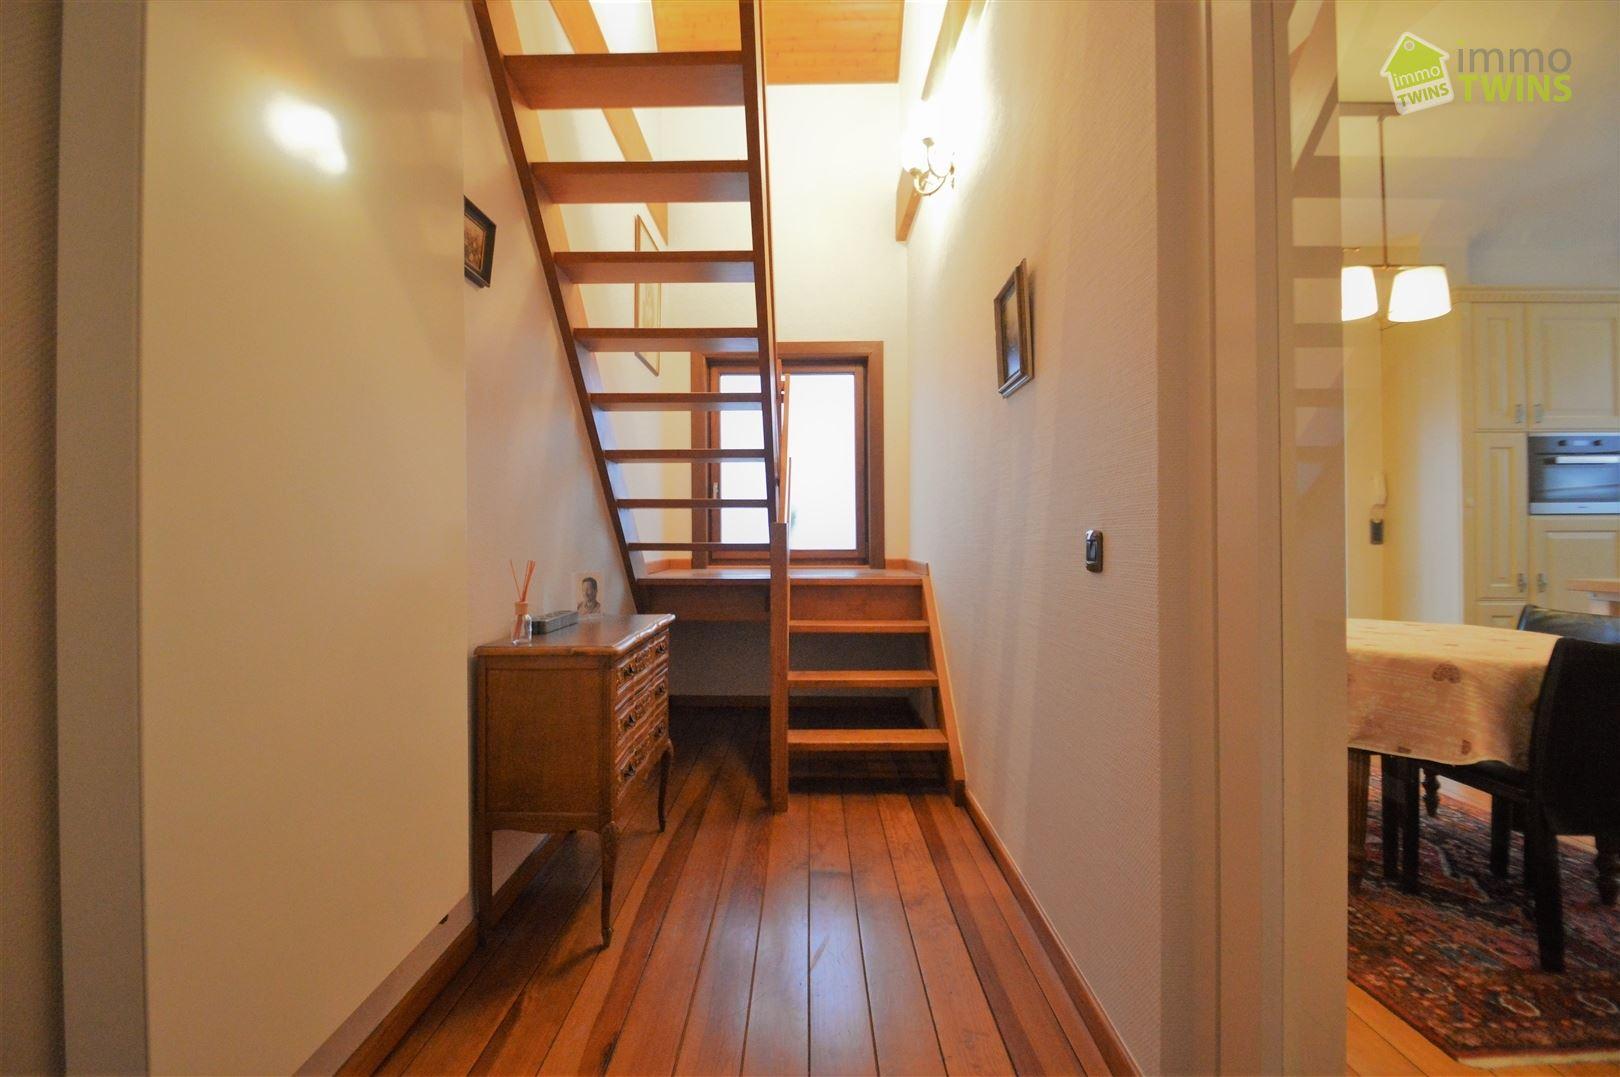 Foto 15 : Duplex/Penthouse te 2890 SINT-AMANDS (België) - Prijs € 449.000